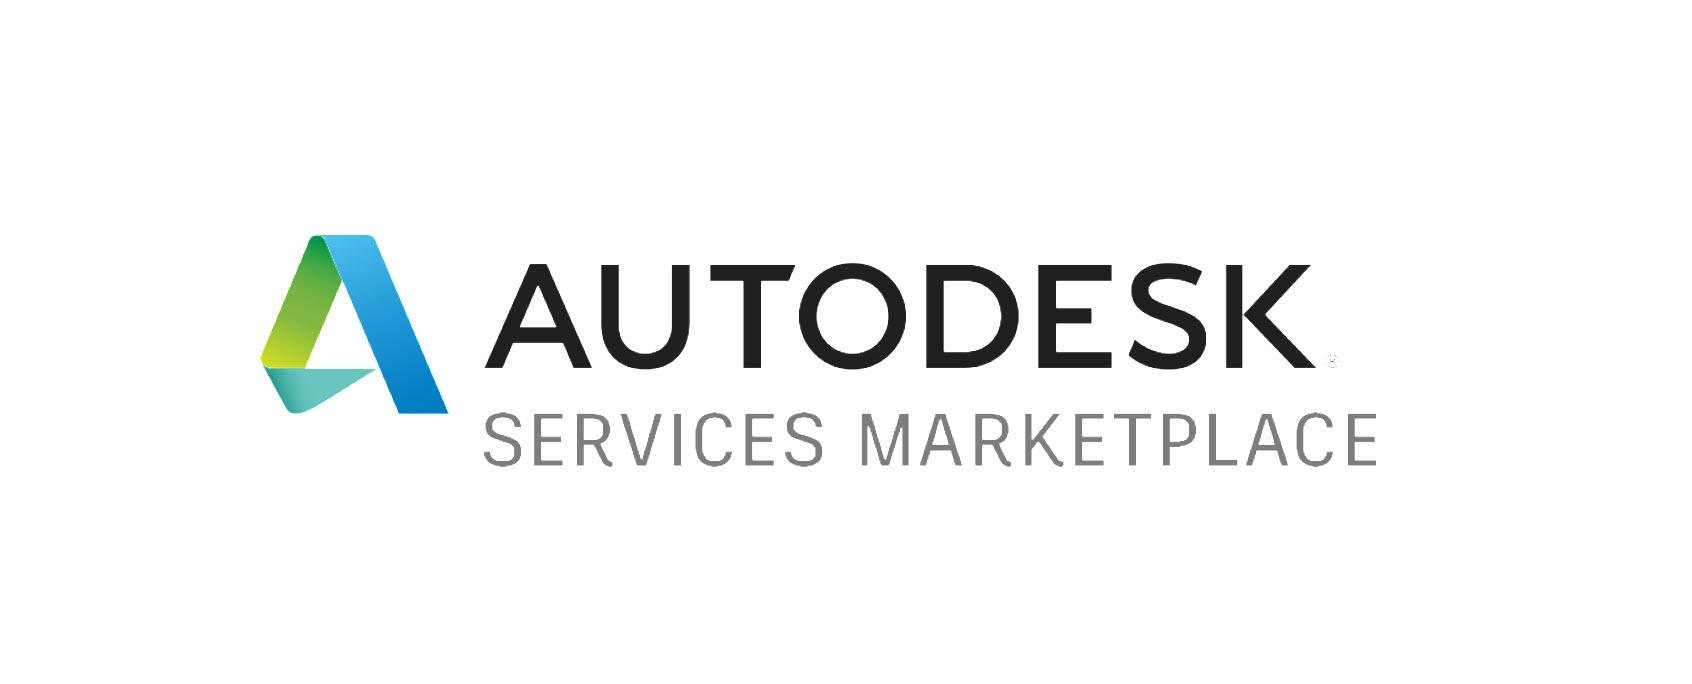 Adesk service marketplace logo